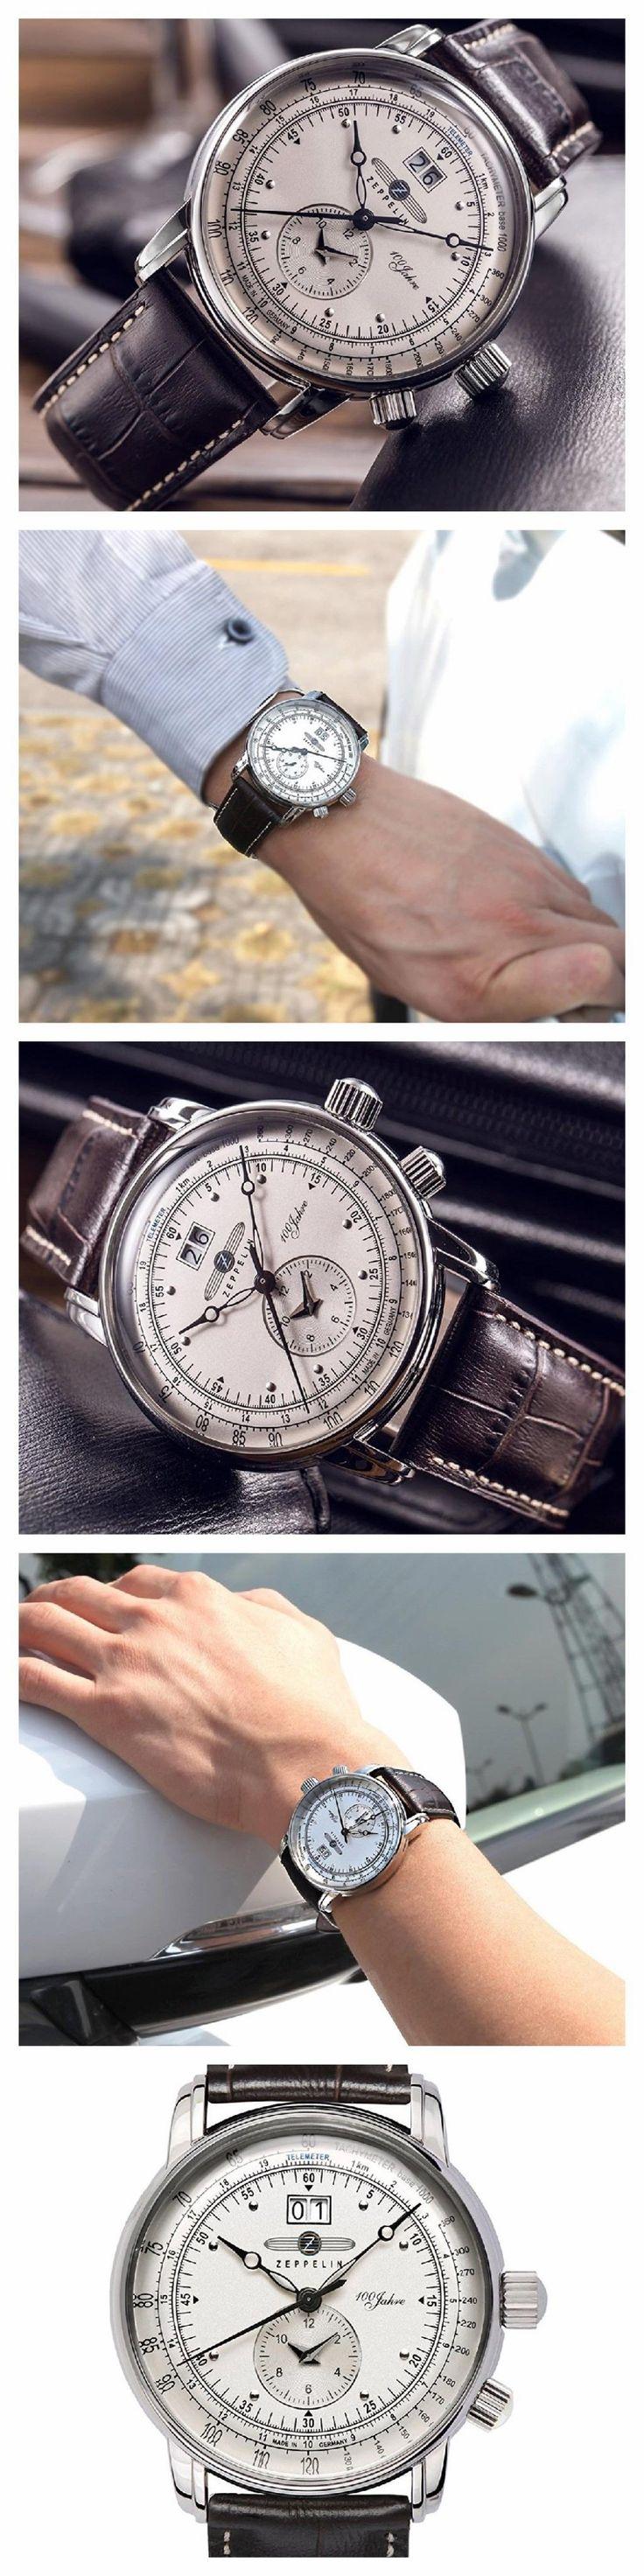 The German adventurer: GRAF ZEPPELIN Dual Time Big Date 100 Years. Style and precision. In ordnung.  #GRAFZEPPELIN  #KhaValeri  https://ro.pinterest.com/KhaValeri/    kha_amz_ZEPdualtime0905_v21